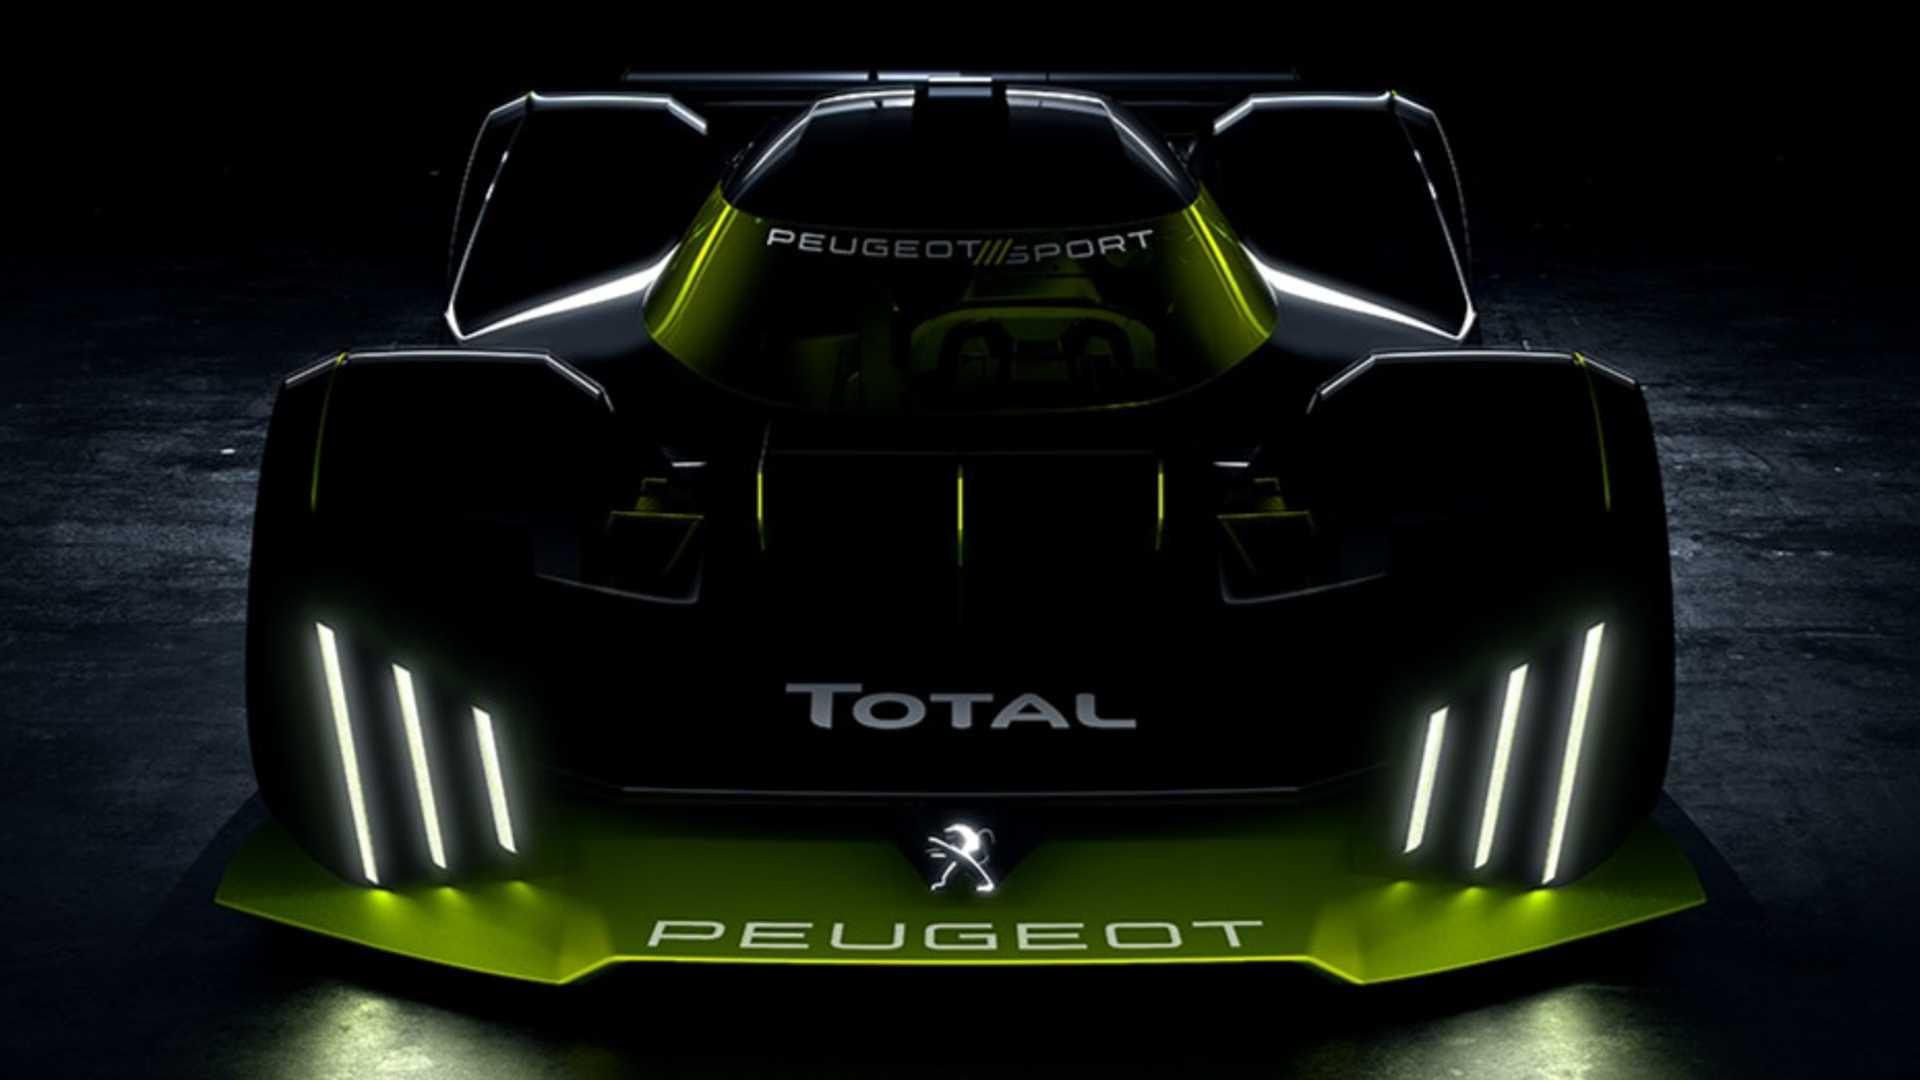 peugeot-sport-hypercar-3